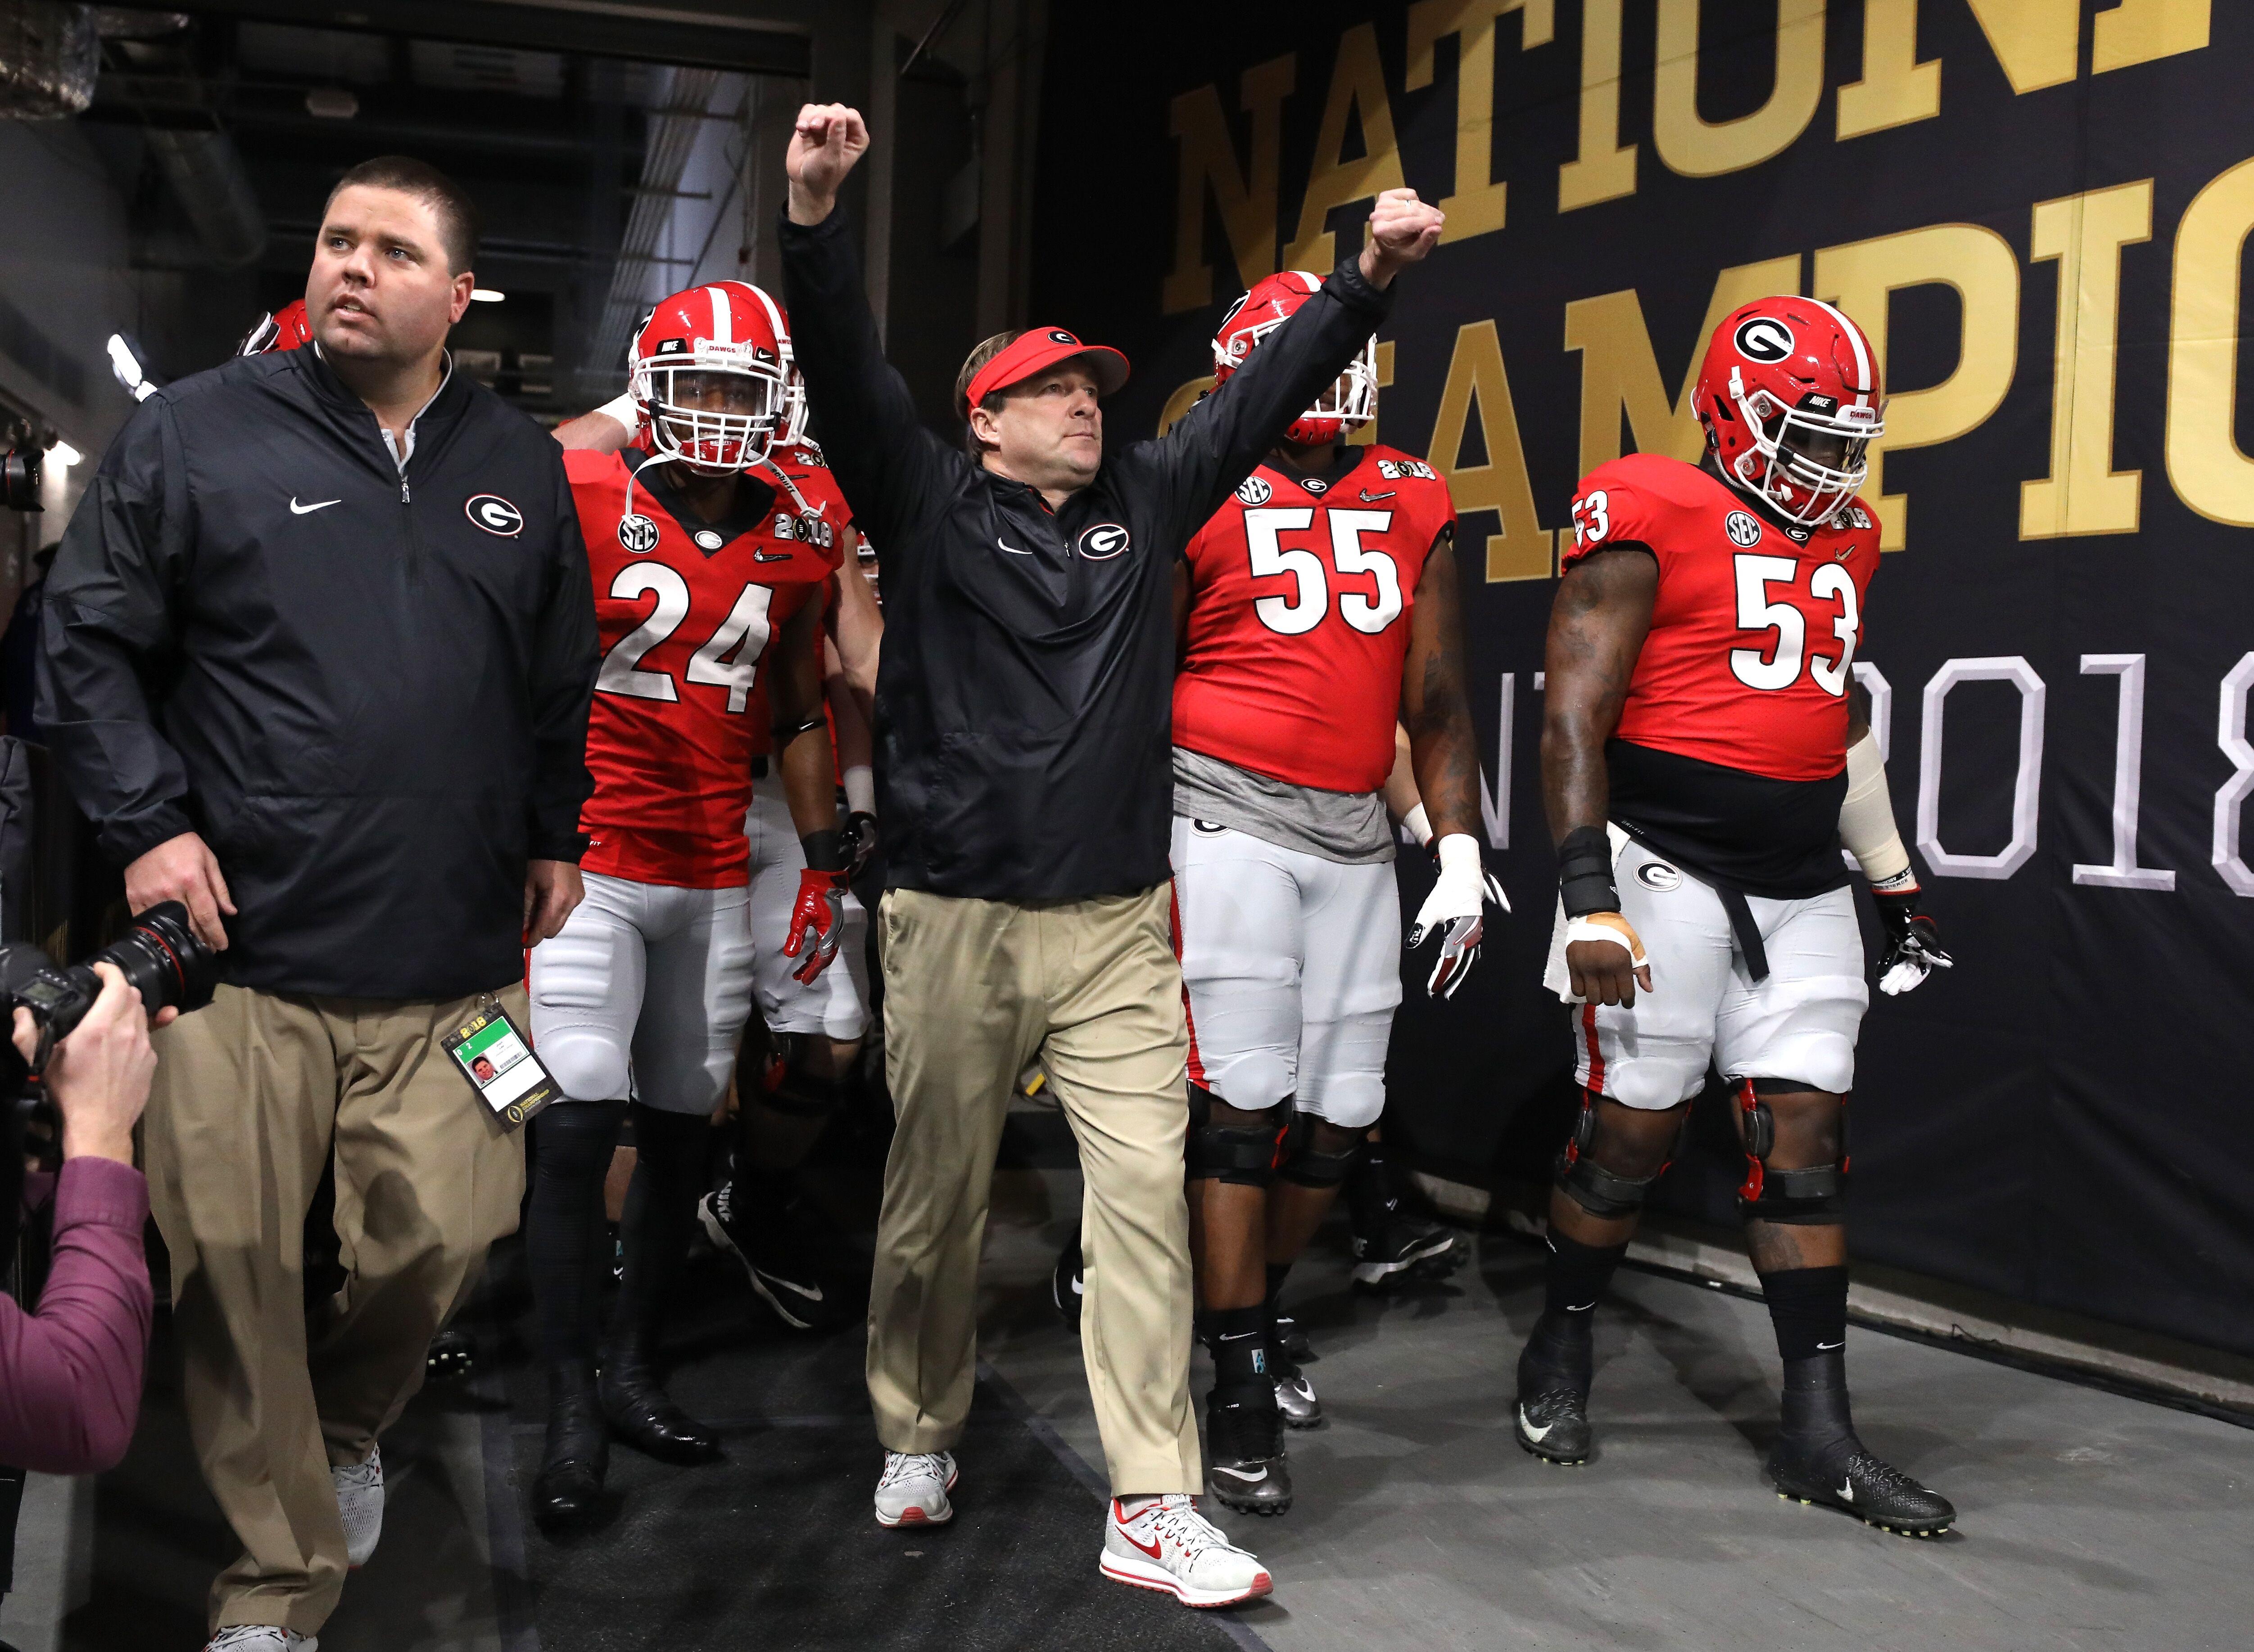 Georgia football: 2 recruits who'll make the 2019 class better than 2018